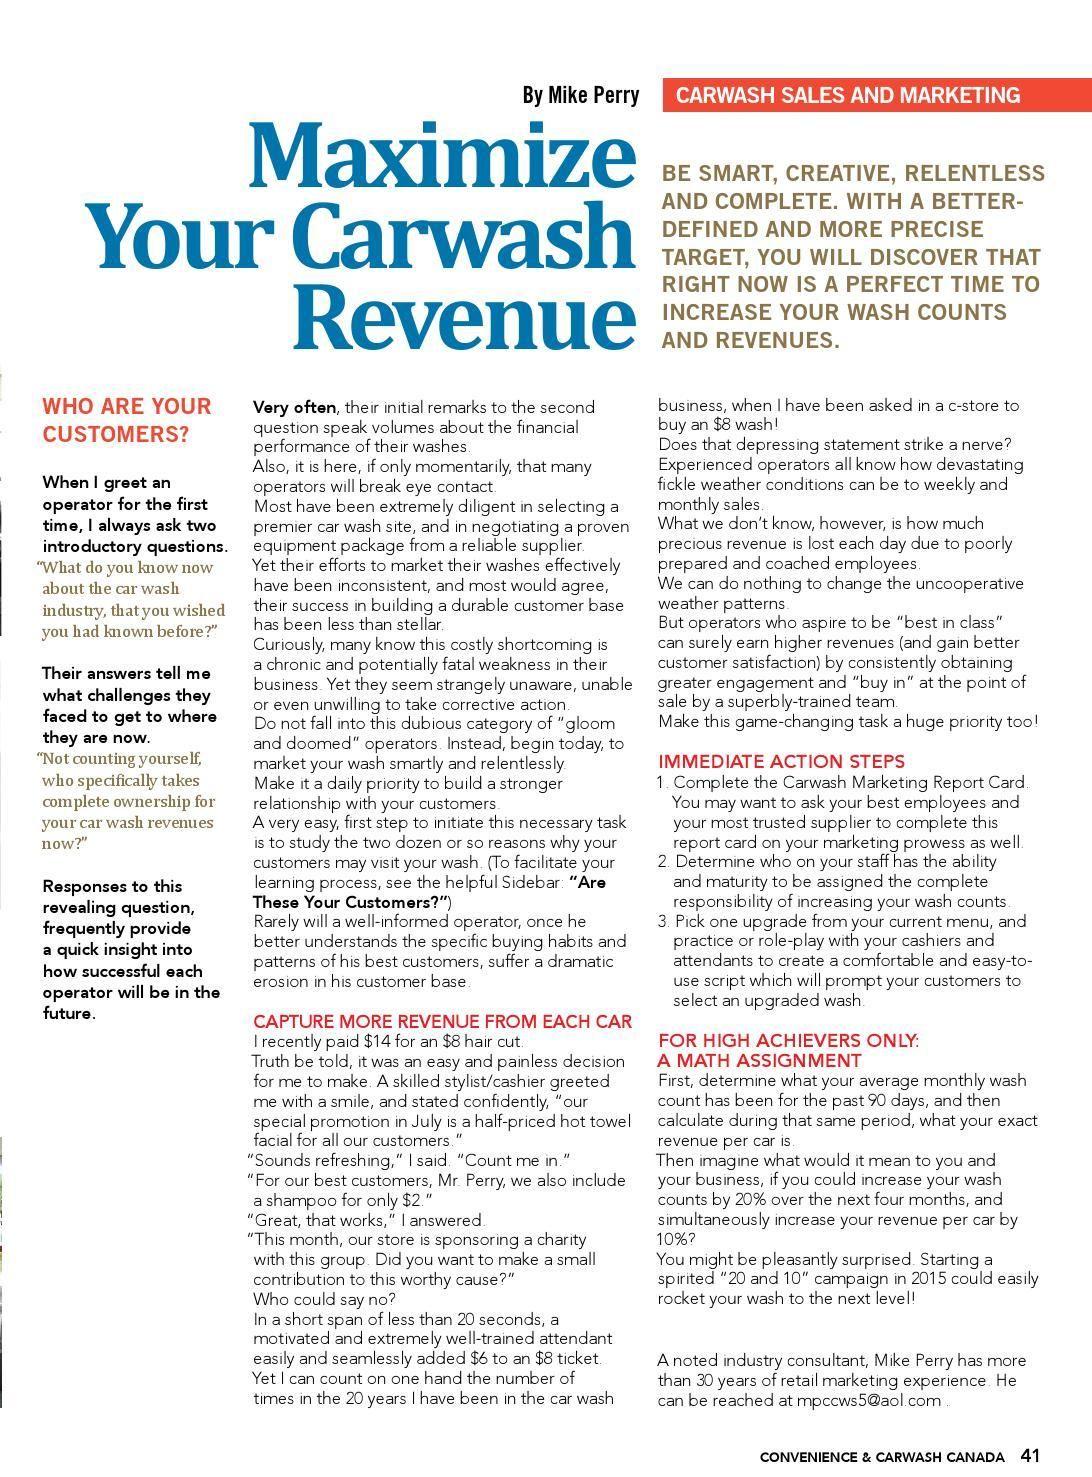 Maximize Carwash Revenue